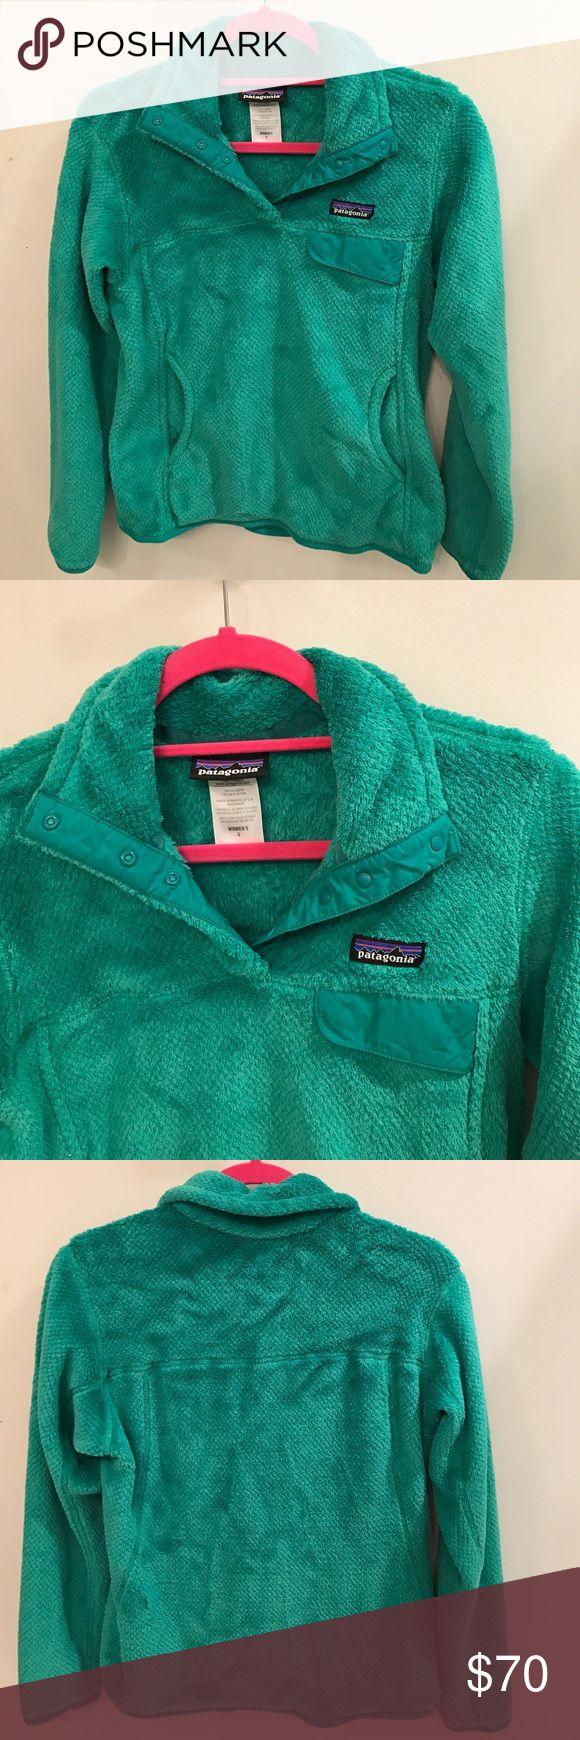 Patagonia Women's Re-Tool Snap-T® Fleece Pullover Patagonia Women's Re-Tool Snap-T® Fleece Pullover Patagonia Jackets & Coats